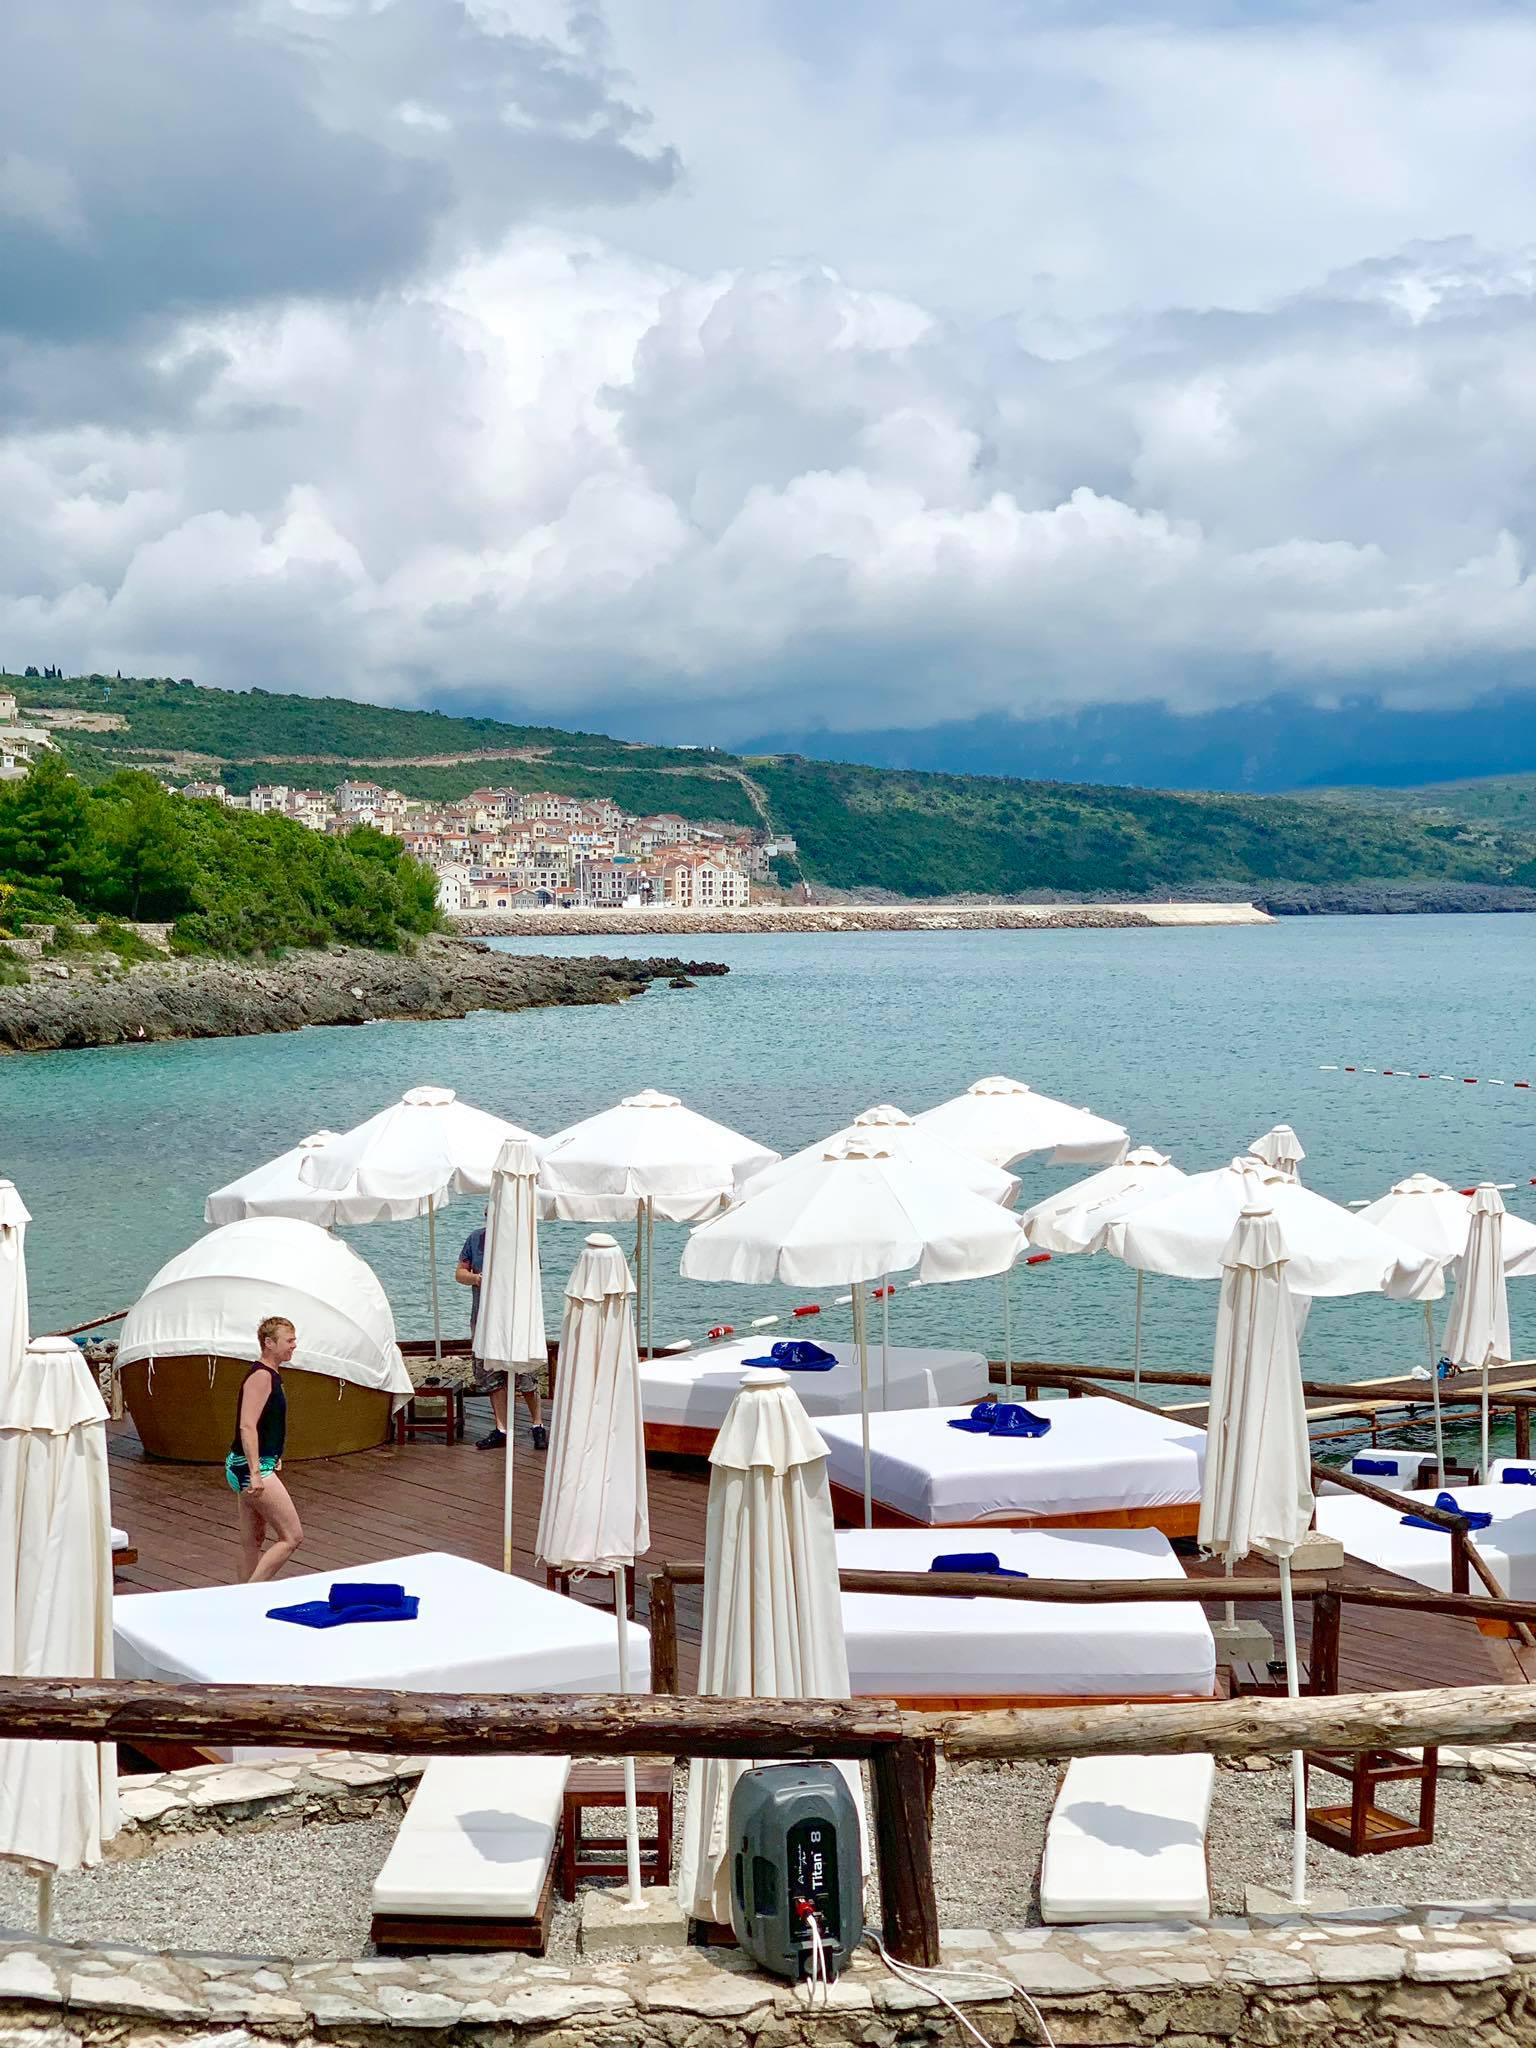 Expat Life in Montenegro Day 5 Trip to Lustica Peninsula and dinner at Konoba Kruso8.jpg